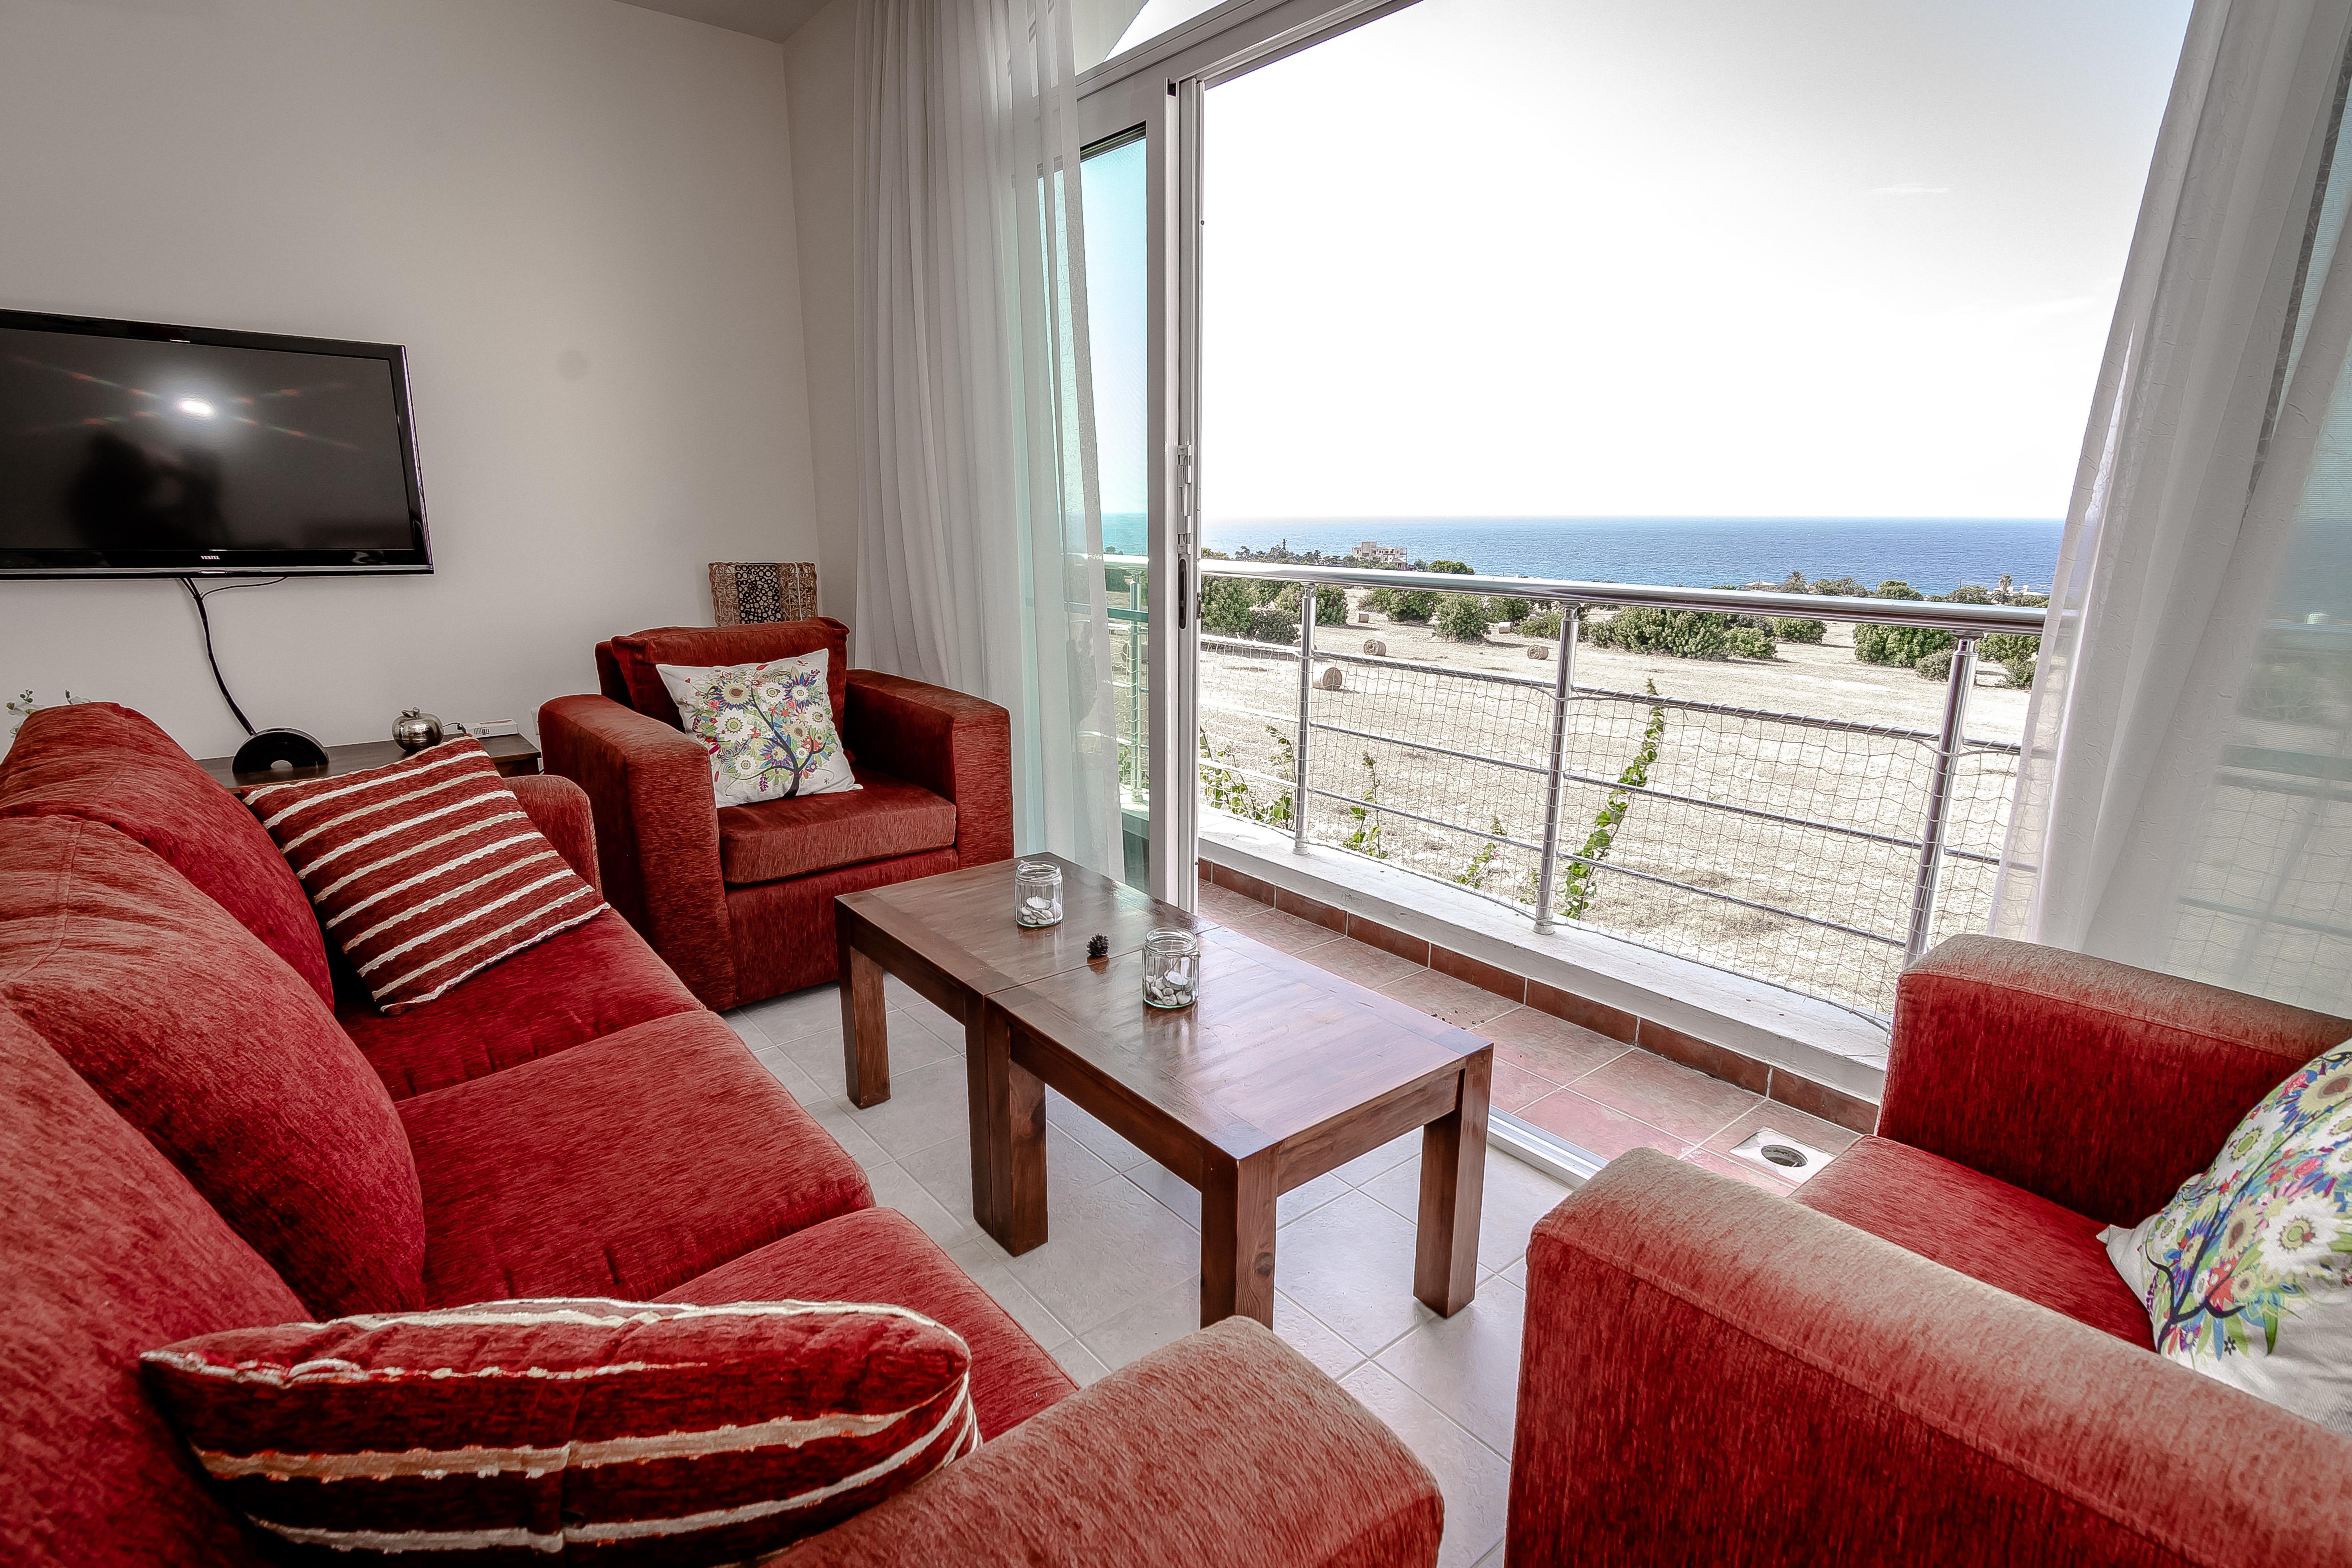 Apartment Joya Cyprus Manzara Penthouse Apartment photo 20273568